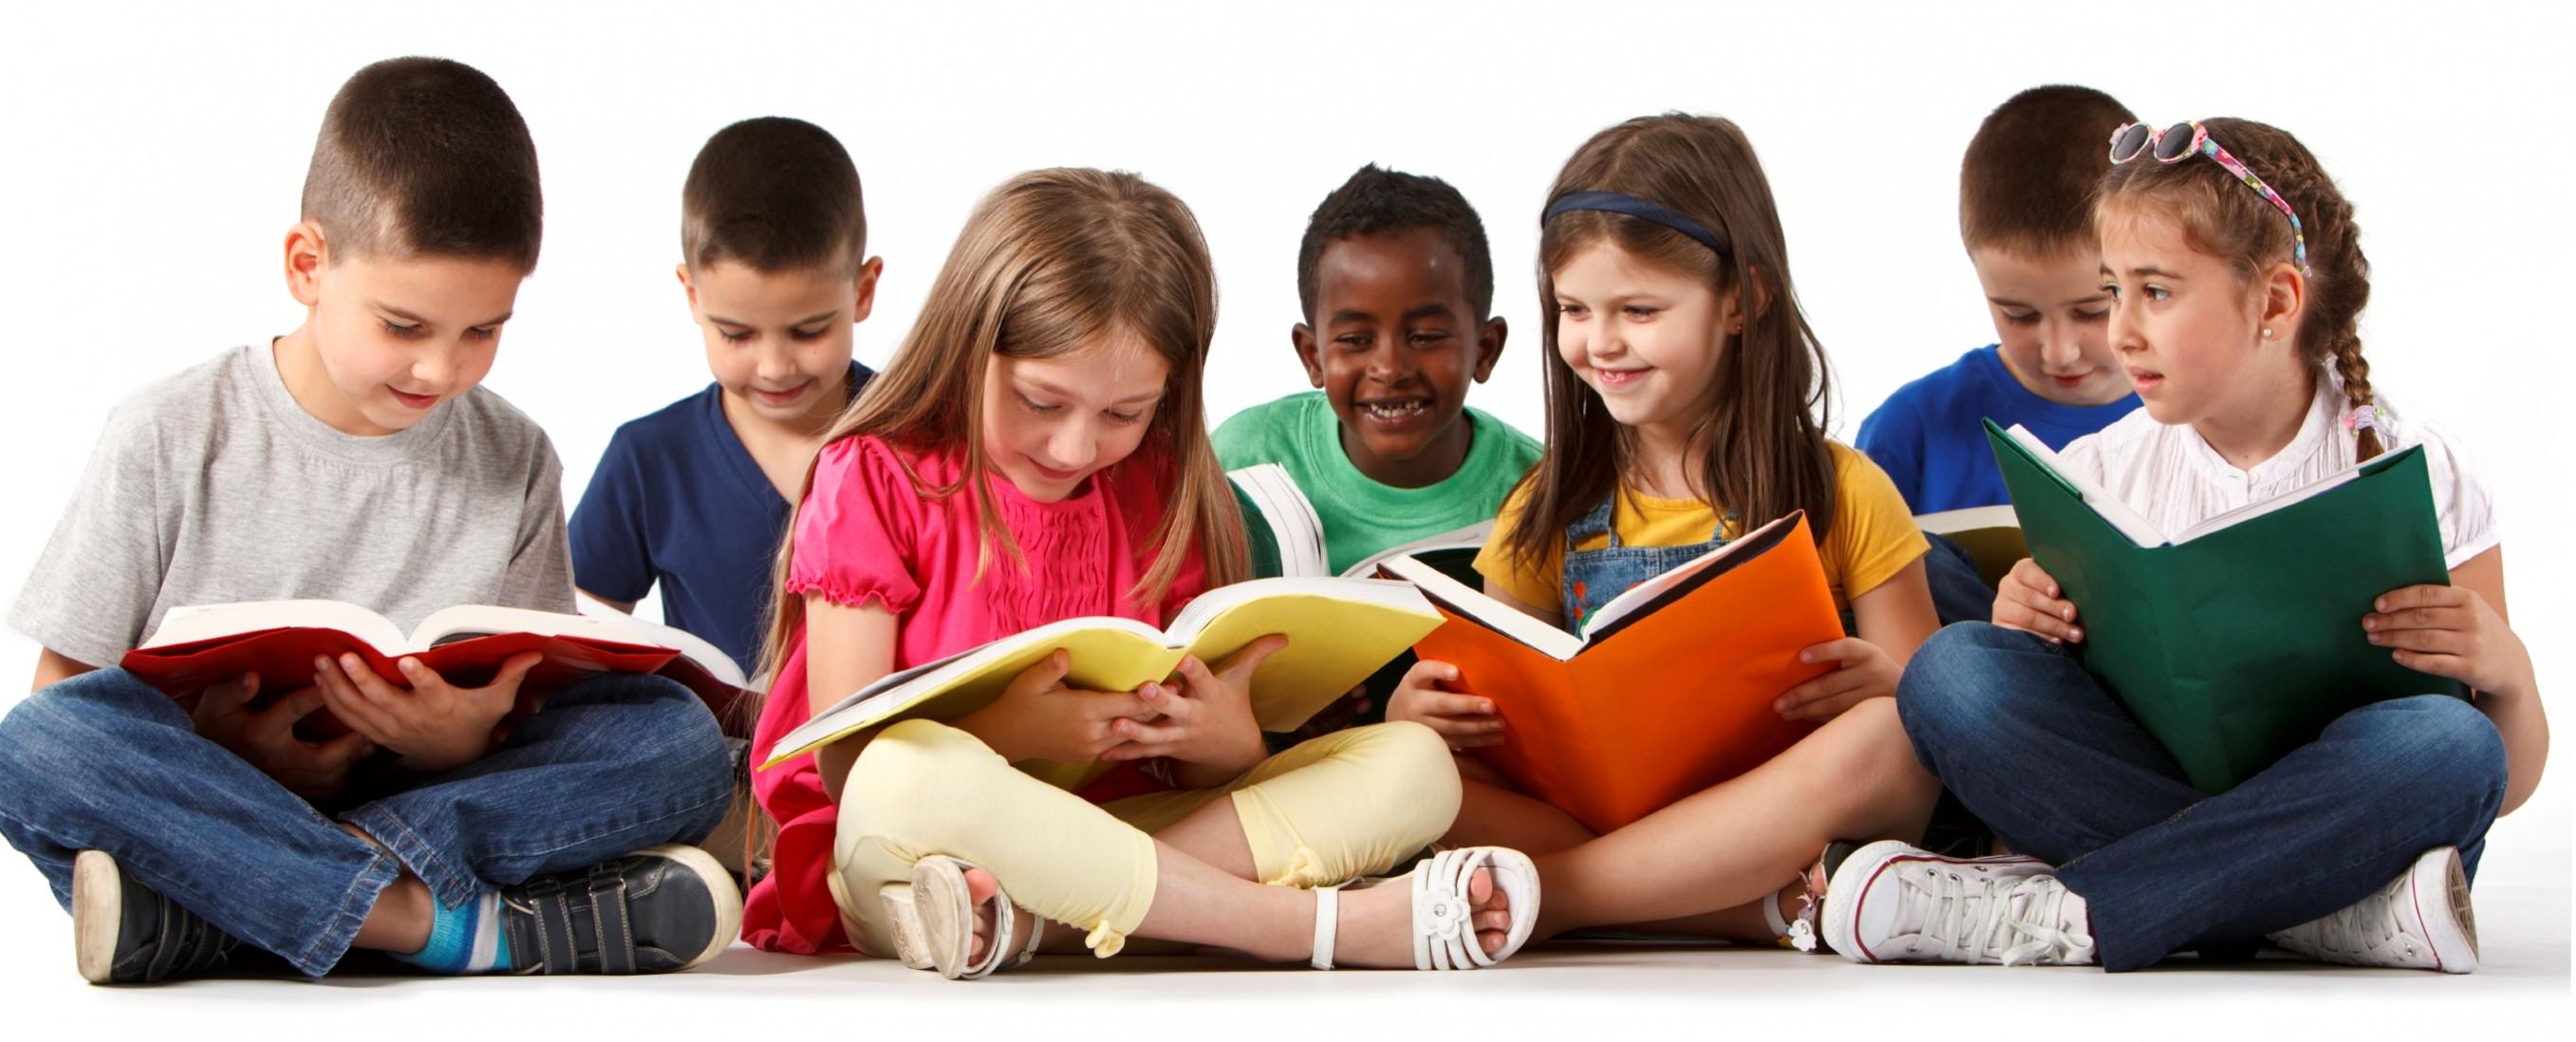 children_reading_istock_20779037_cropped_2715x1098xauto.jpg